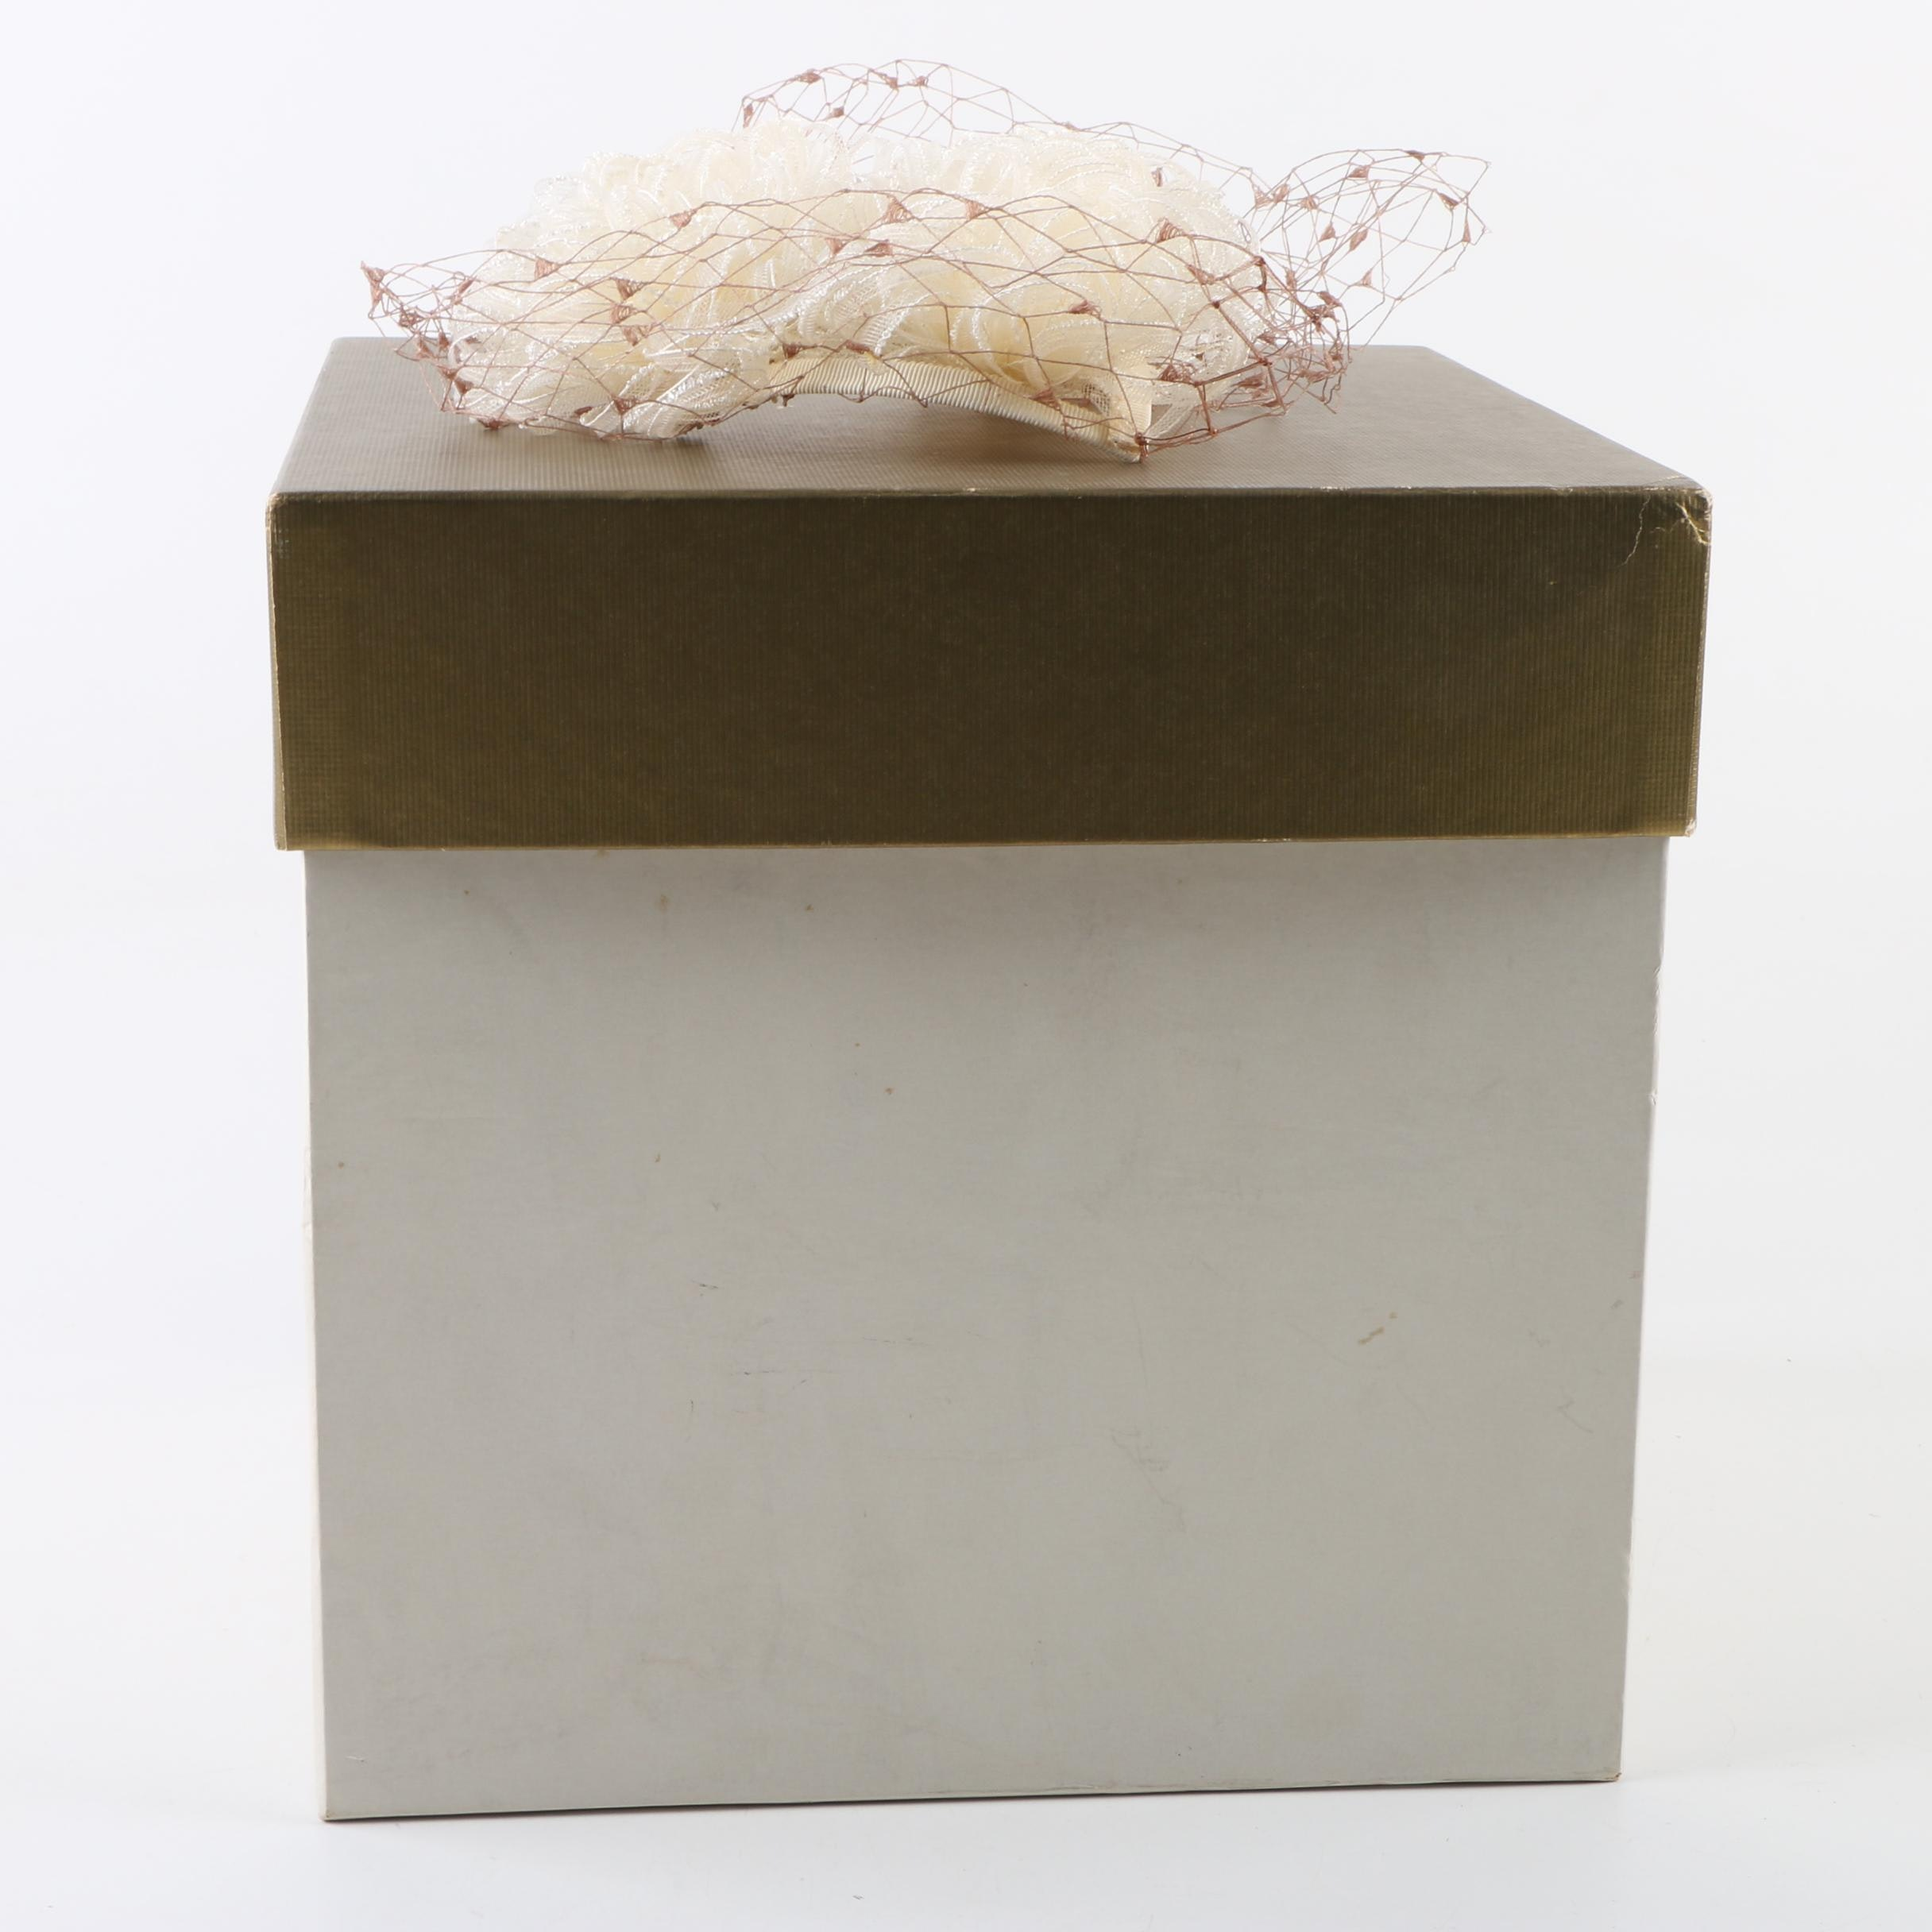 Vintage Blum's - Vogue Chicago Cream and Brown Fascinator with Box